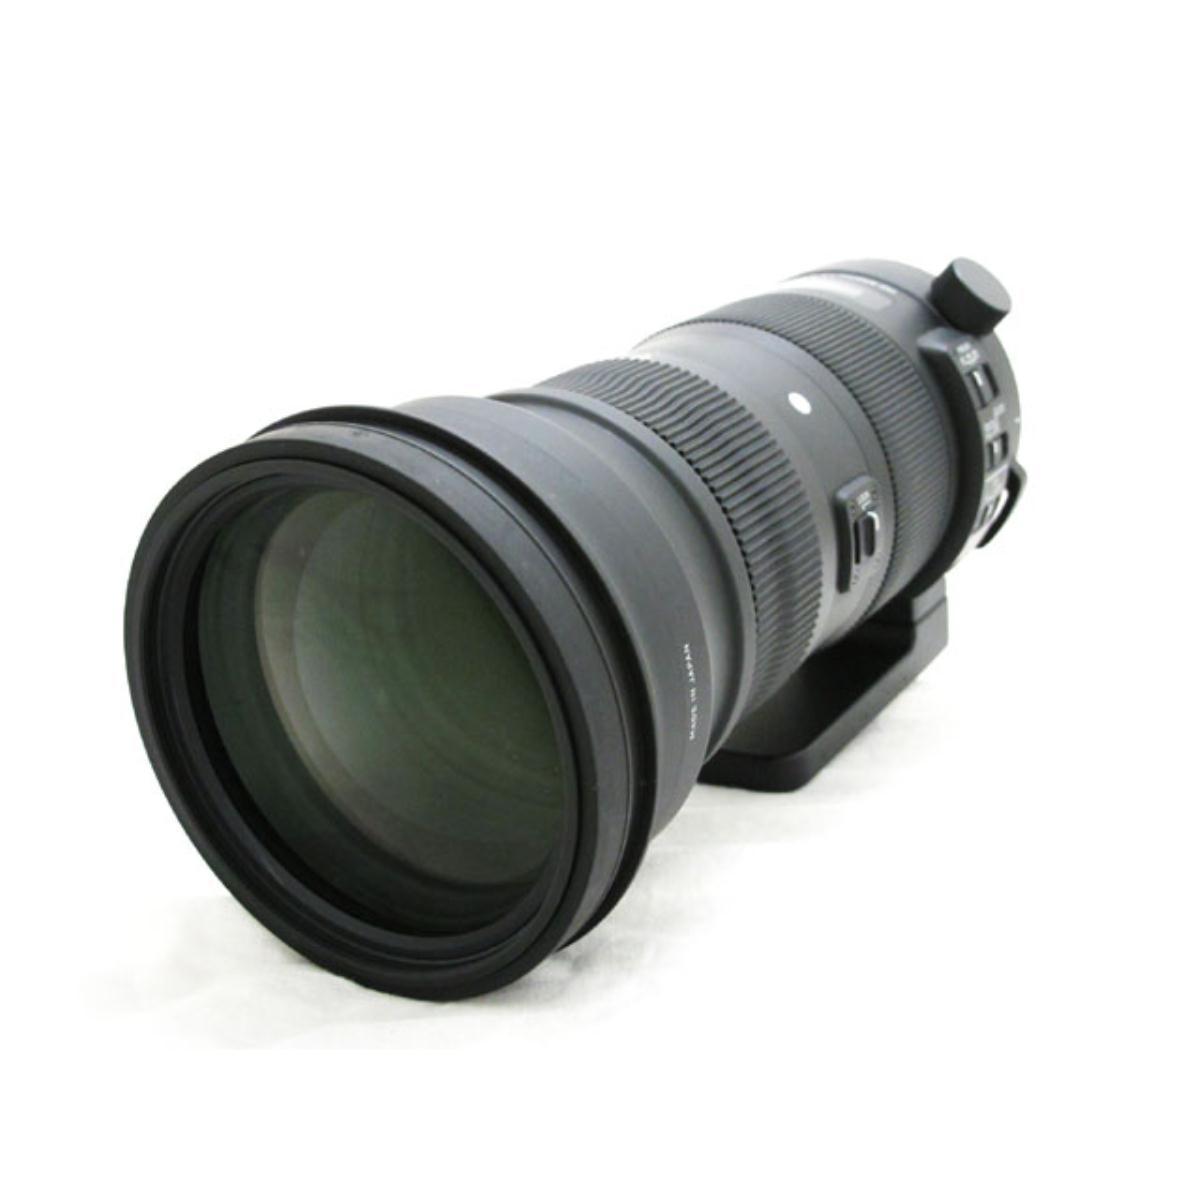 SIGMA ニコン(S)150-600mm F5-6.3DG OS【中古】